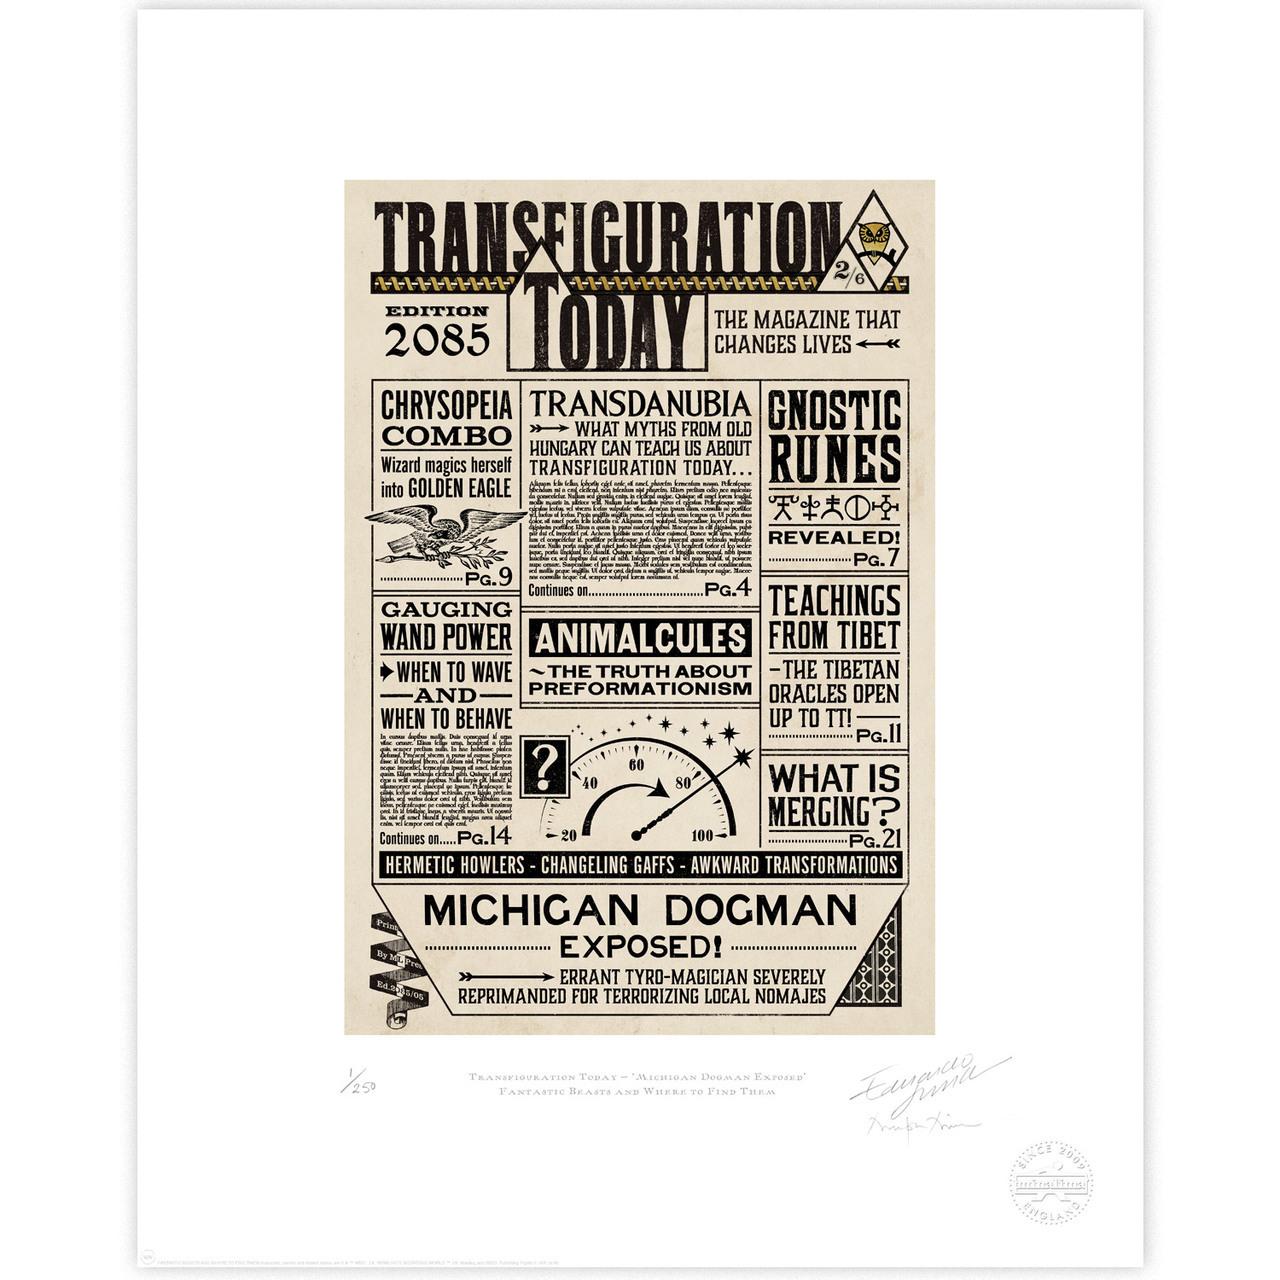 Transfiguration Today: Michigan Dogman Exposed